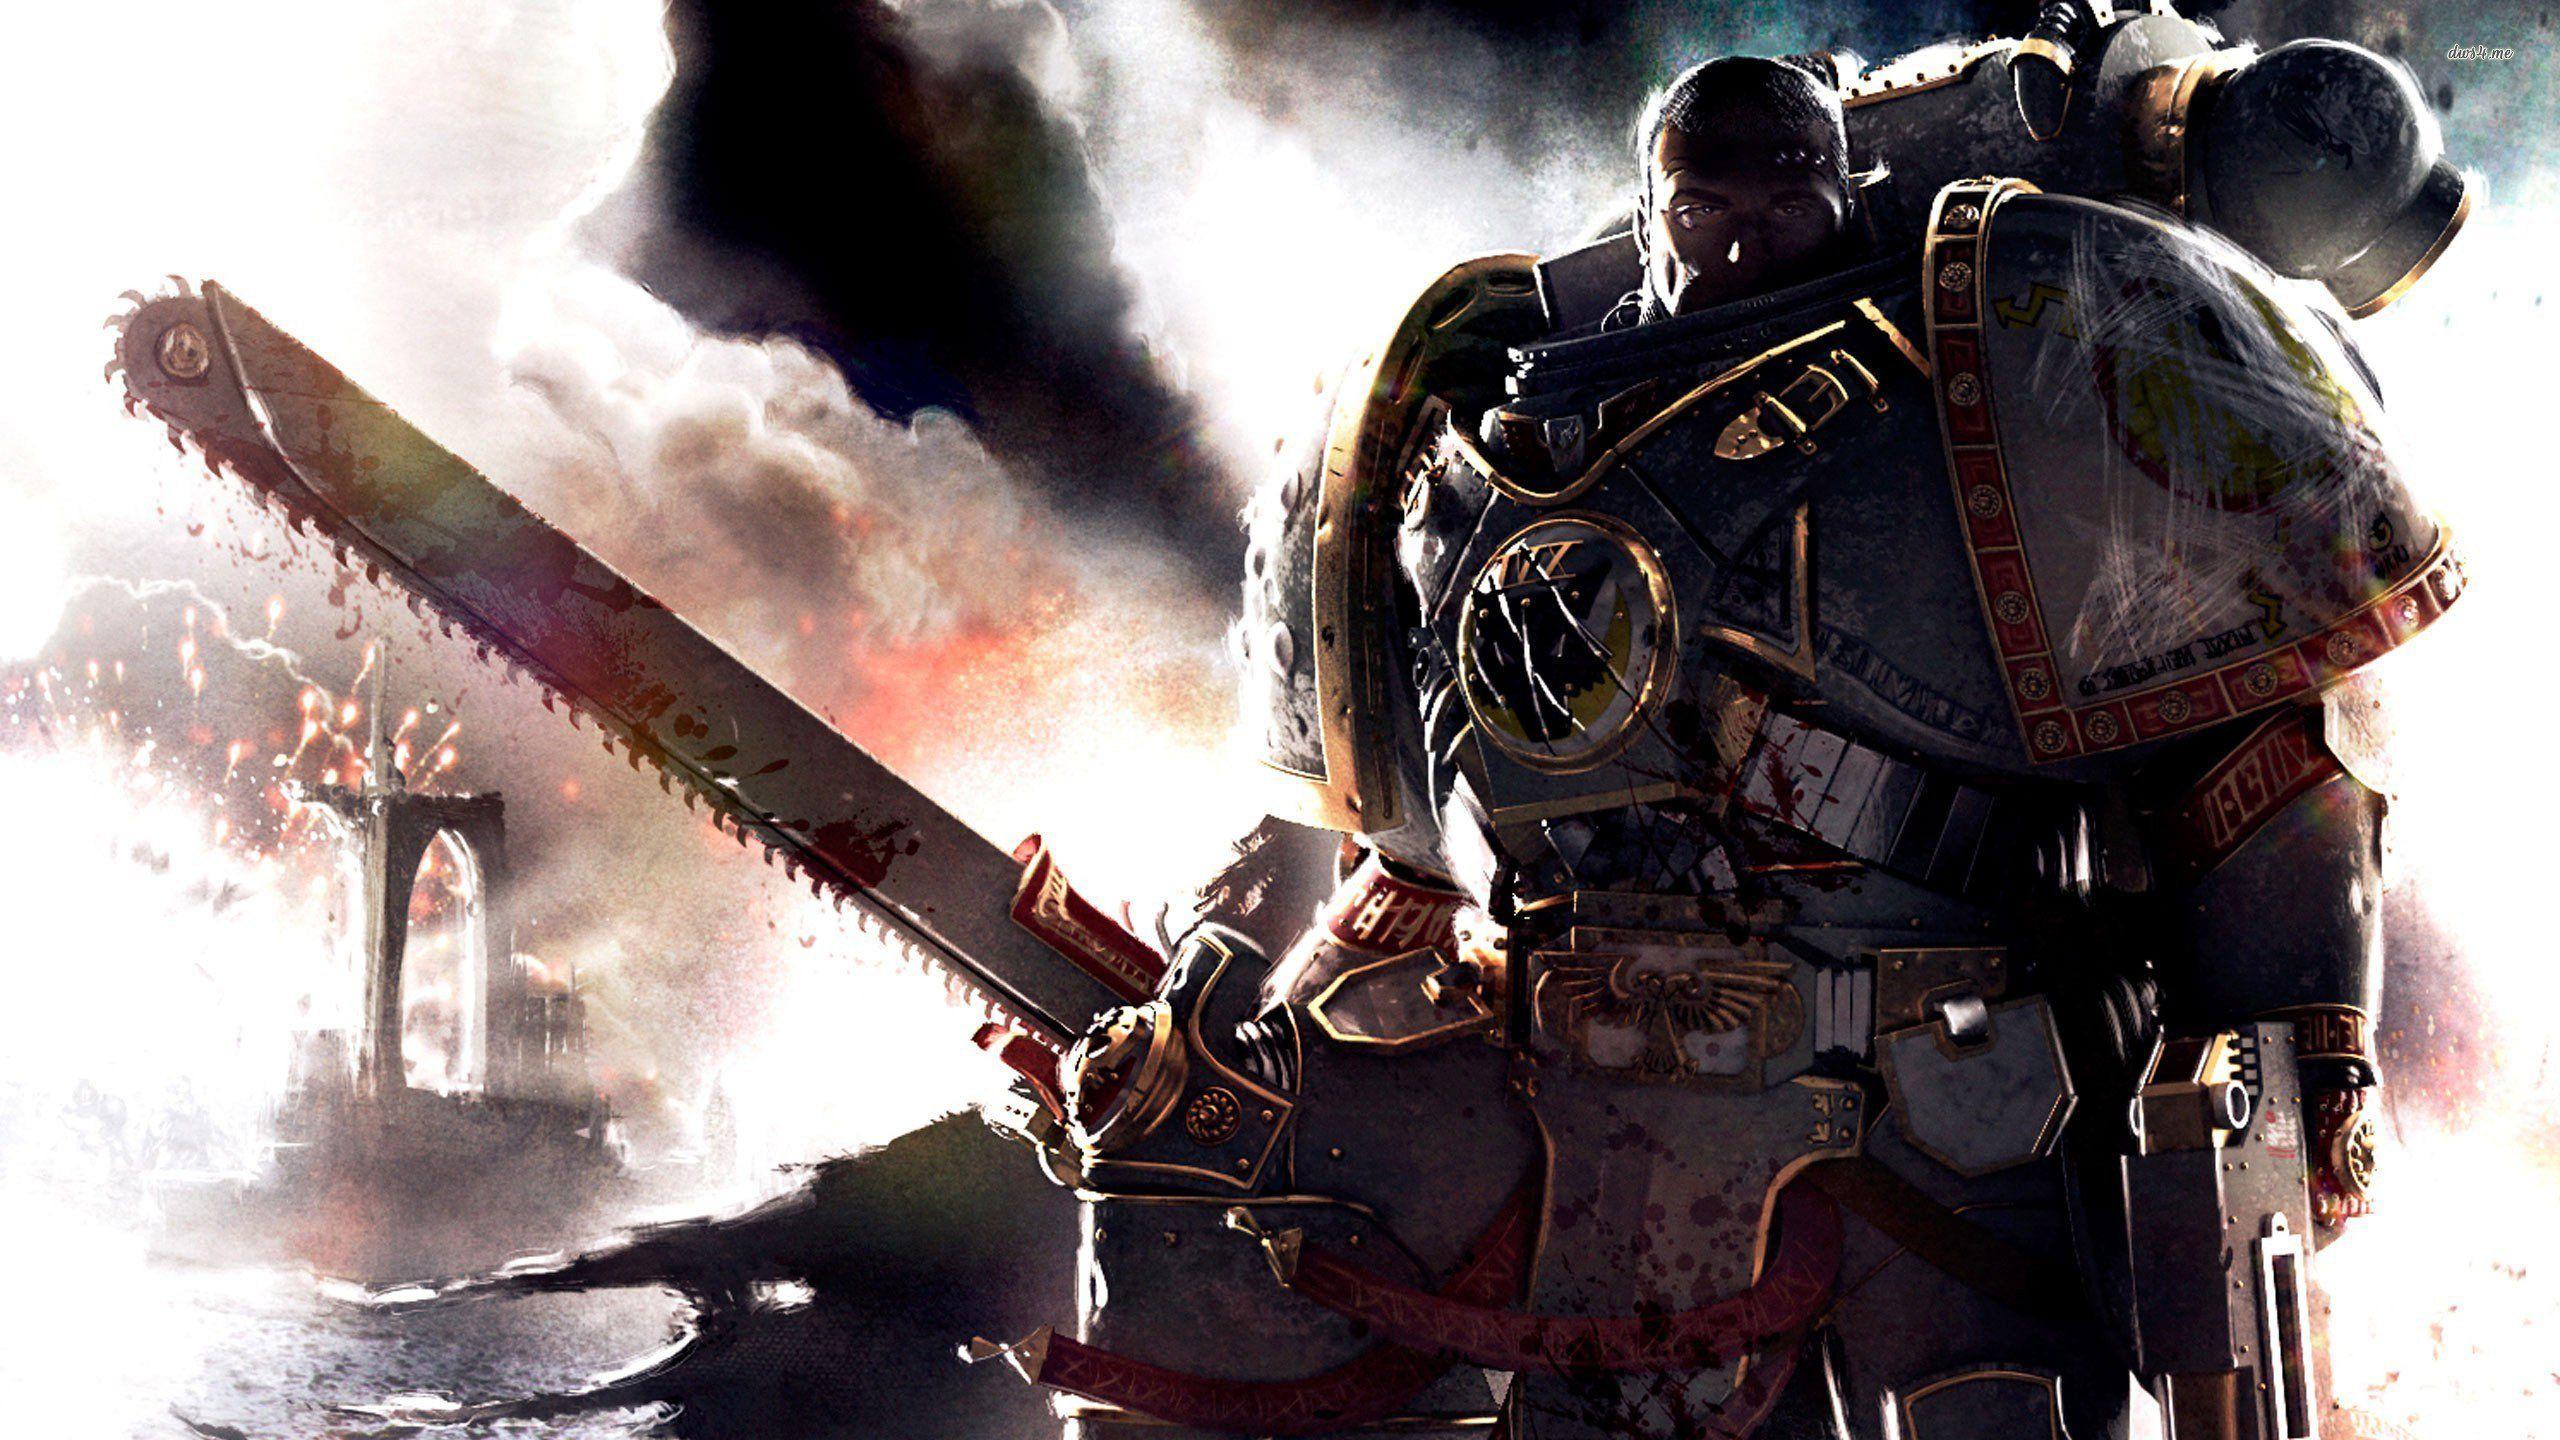 3 июня пройдёт презентация игр по Warhammer